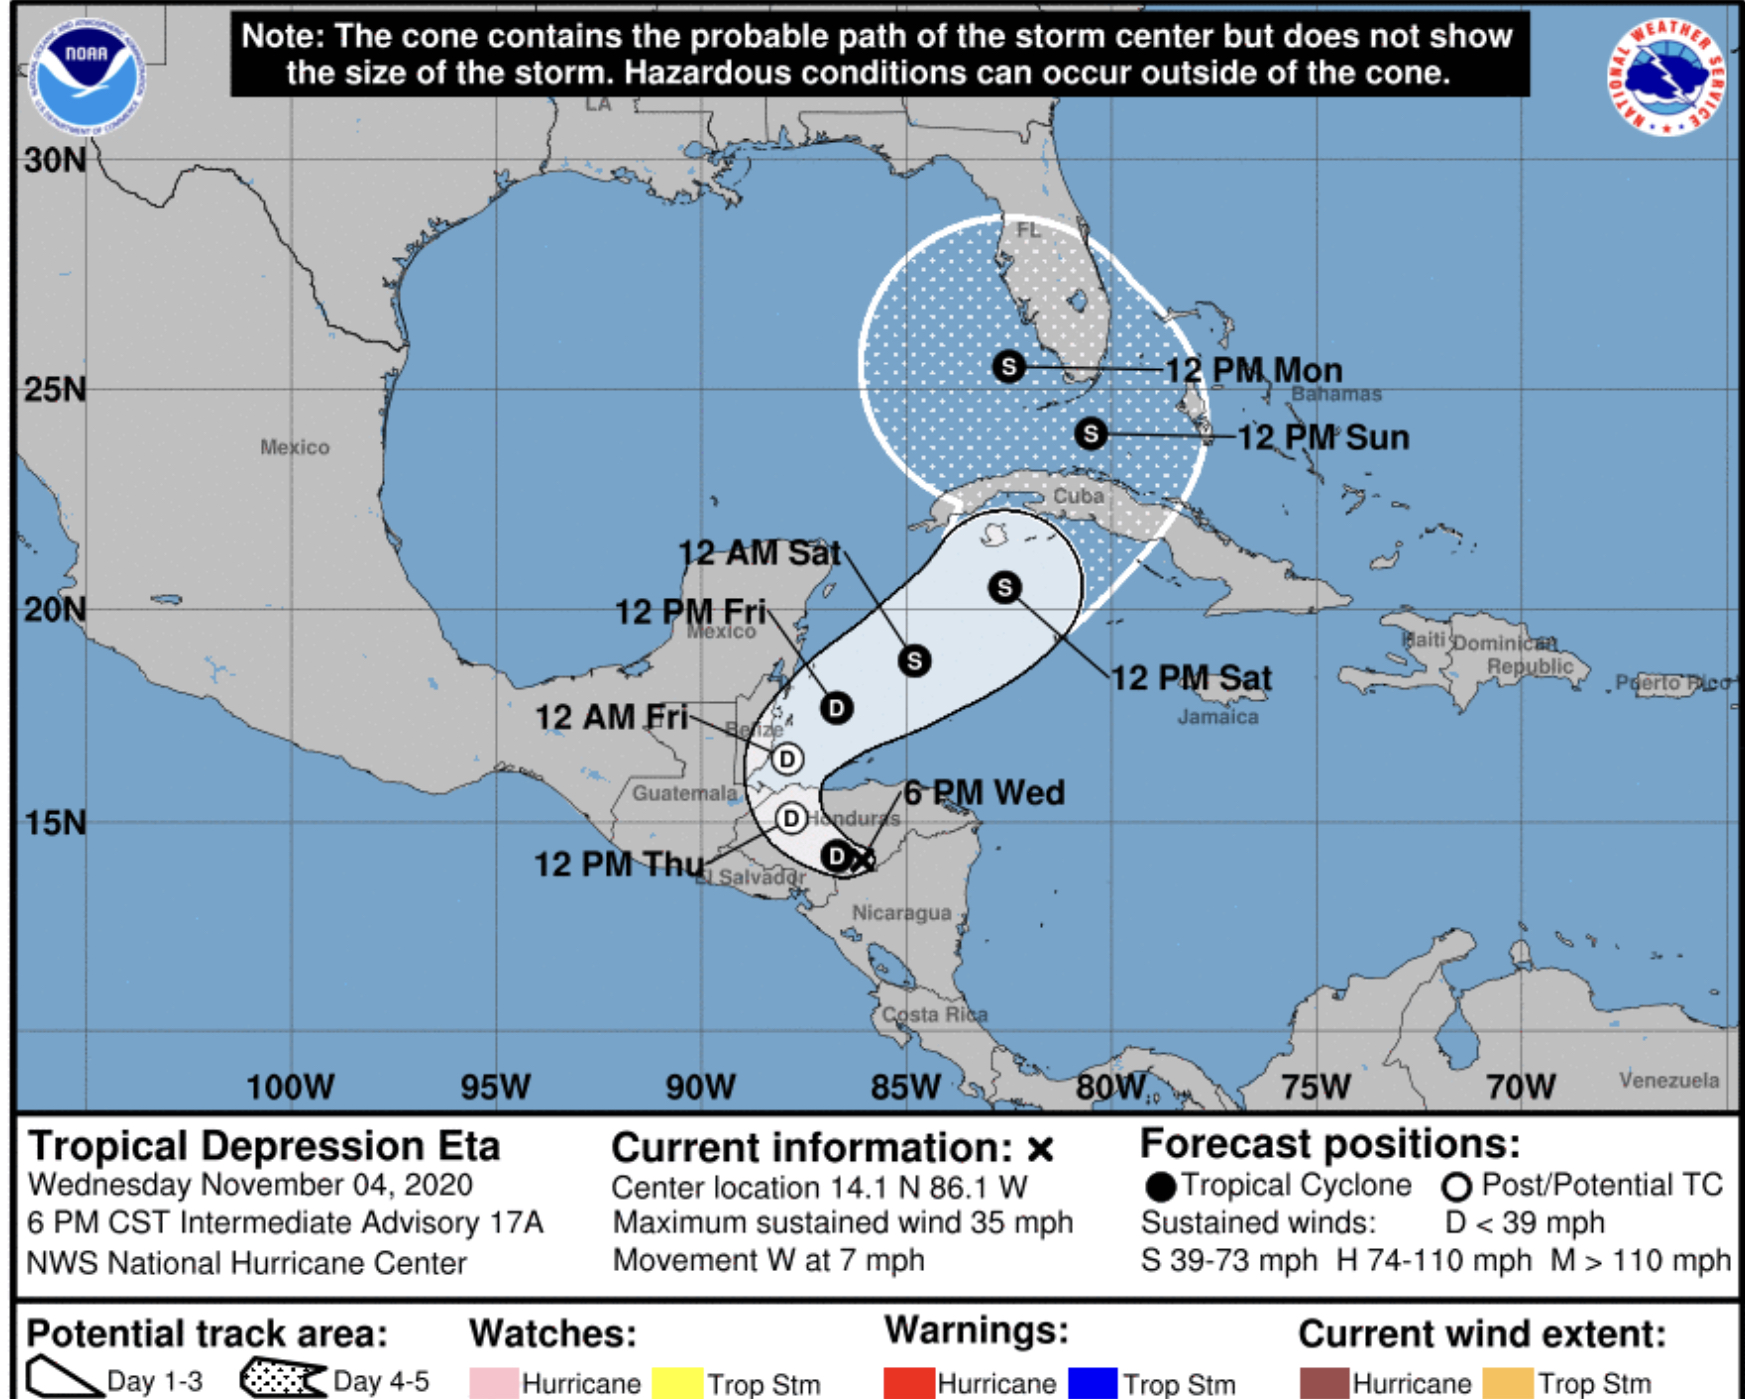 eta national hurricane center wednesday november 4, 2020 8p